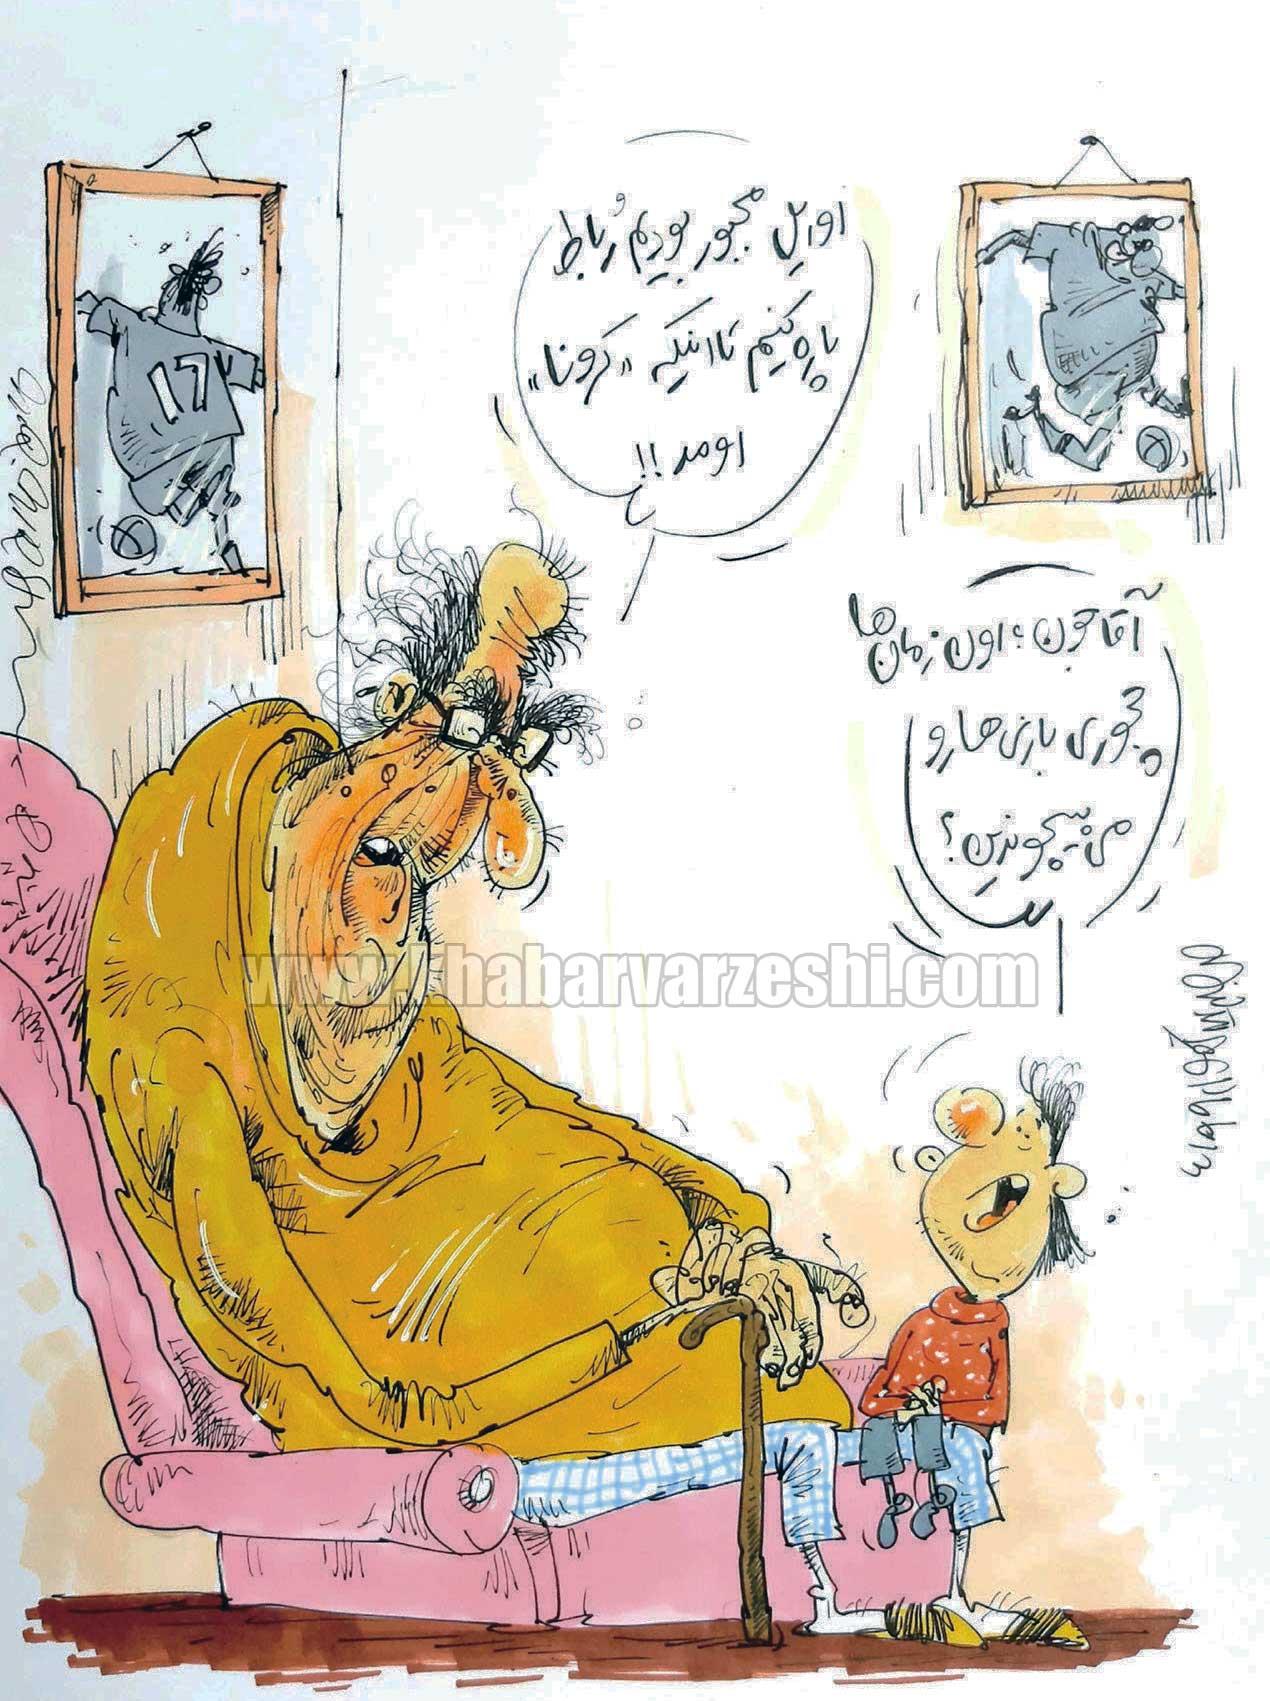 کارتون محمدرضا میرشاهولد درباره رباط صلیبی و ویروس کرونا